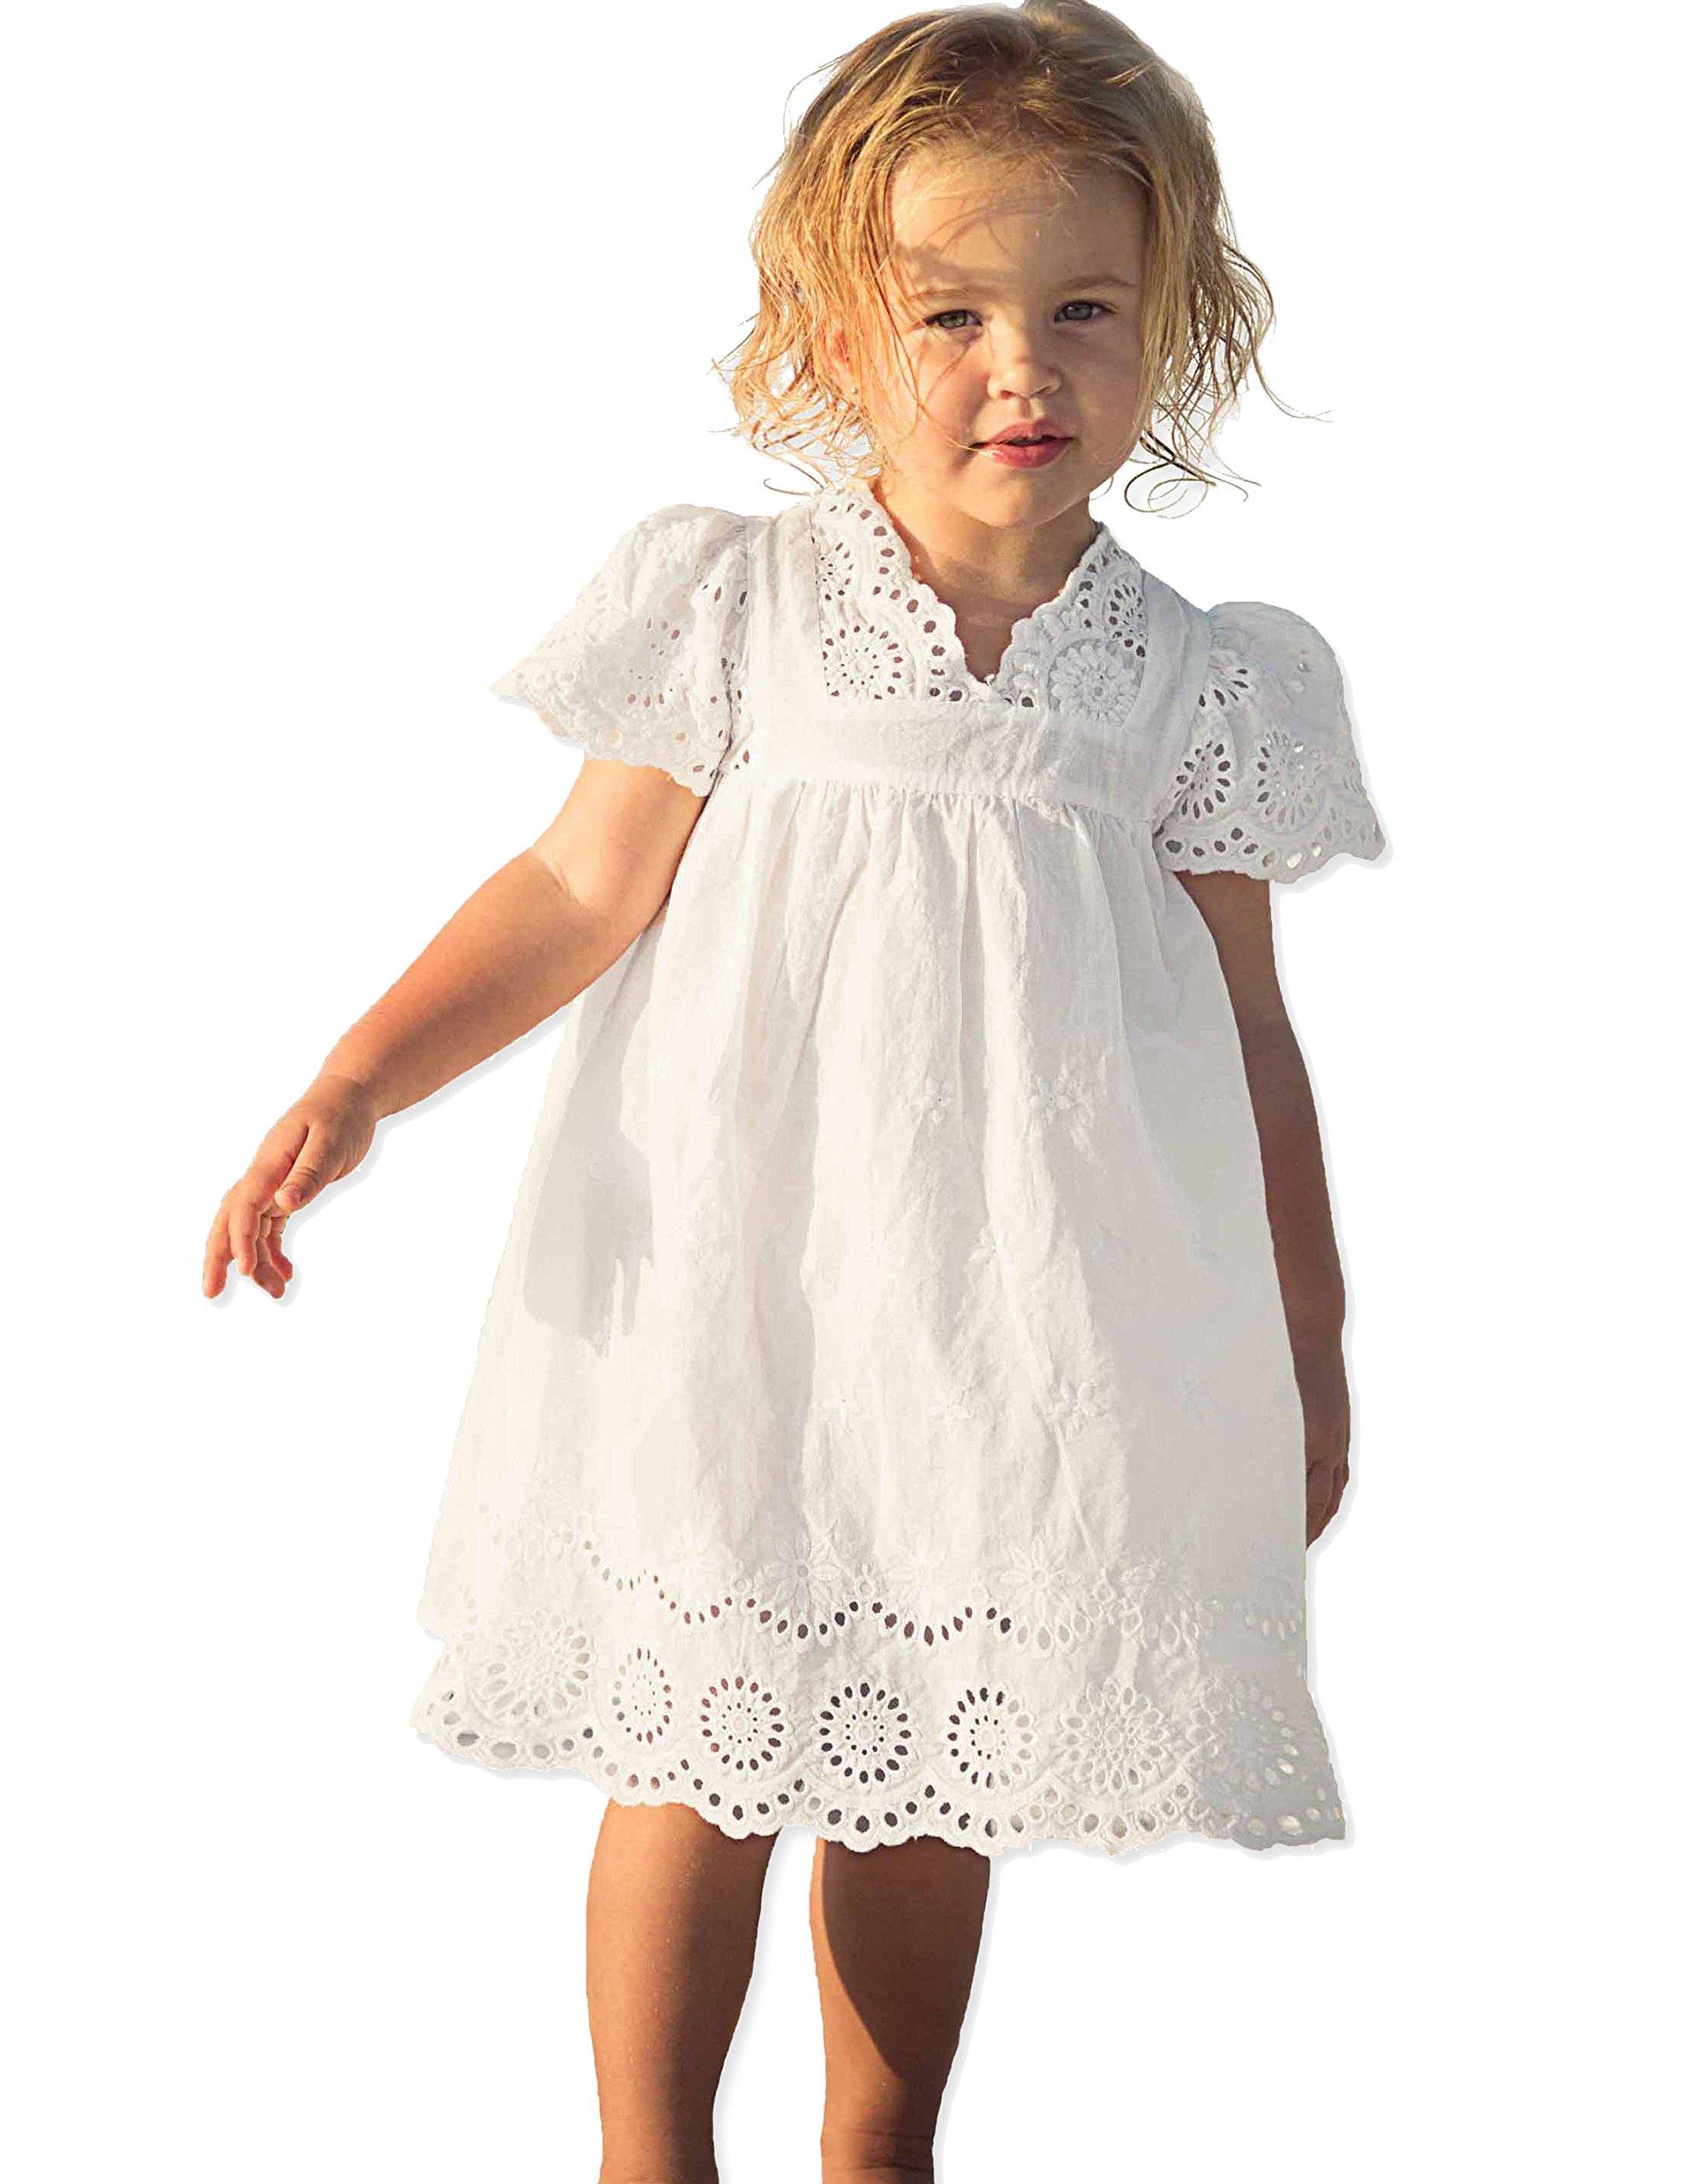 VYU White Cotton Dress Girls Flutter Short Sleeve Flower Princess Dress Size, 10, Tag size 140